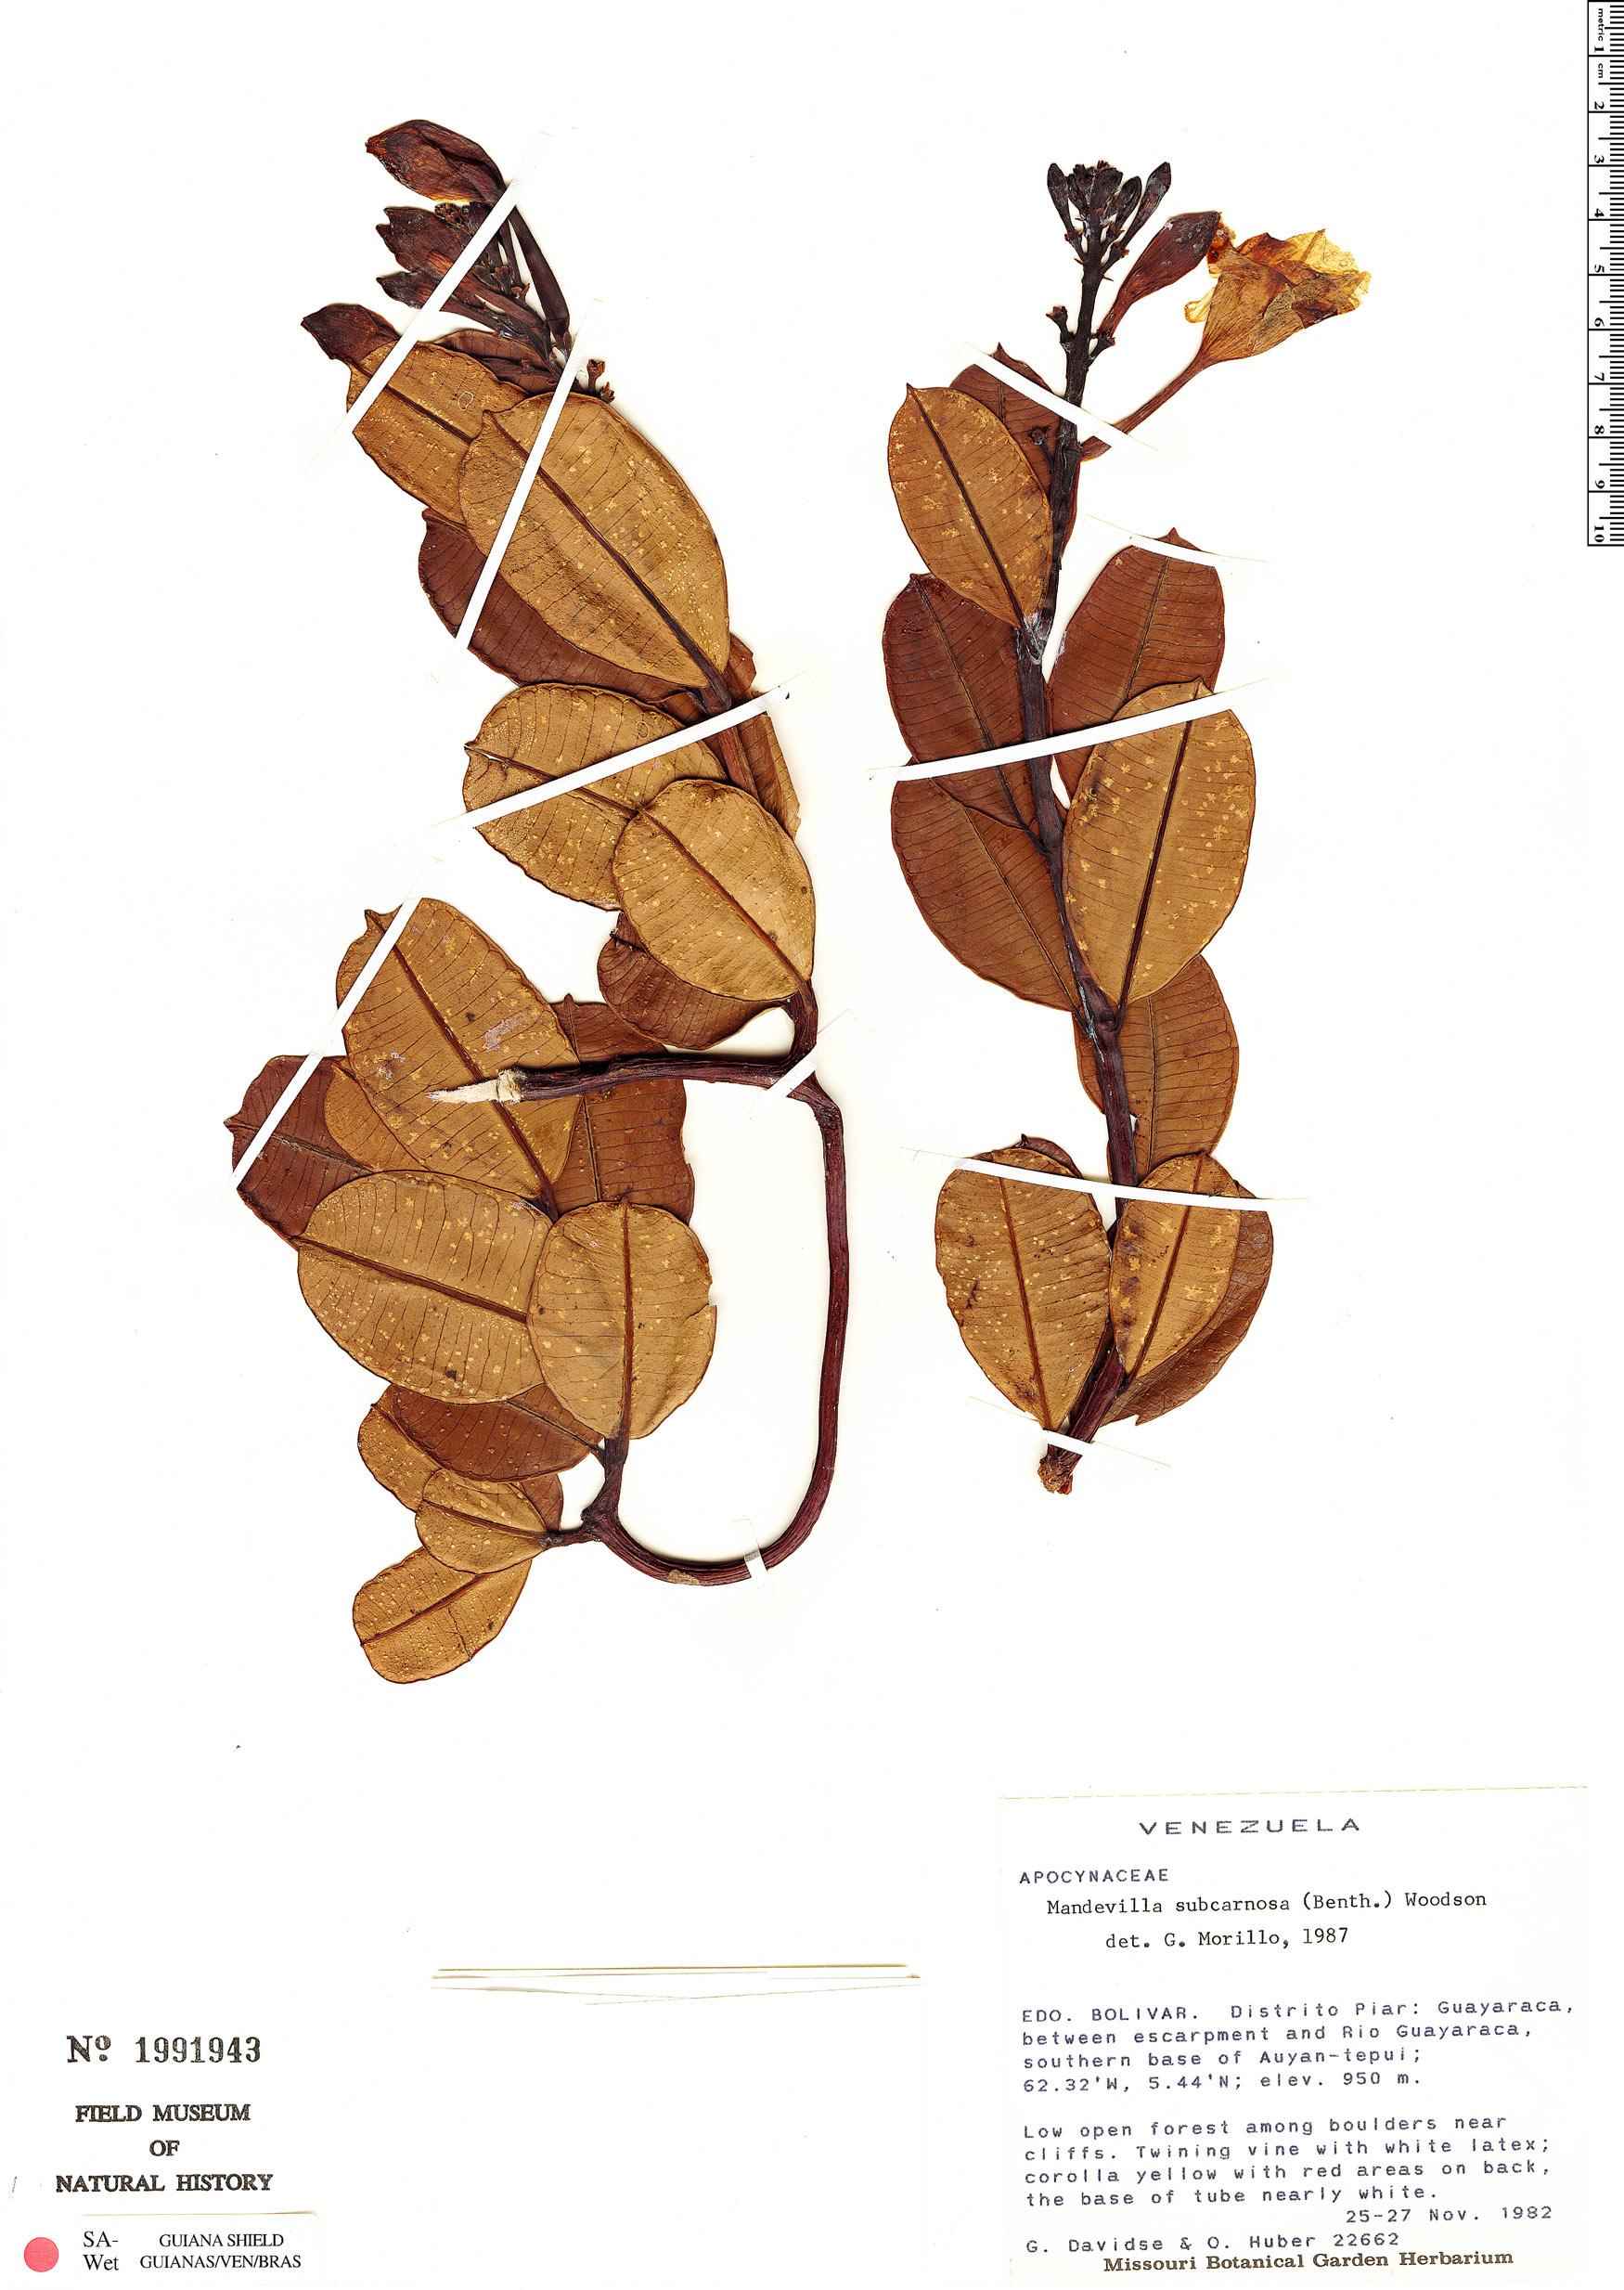 Espécimen: Mandevilla subcarnosa